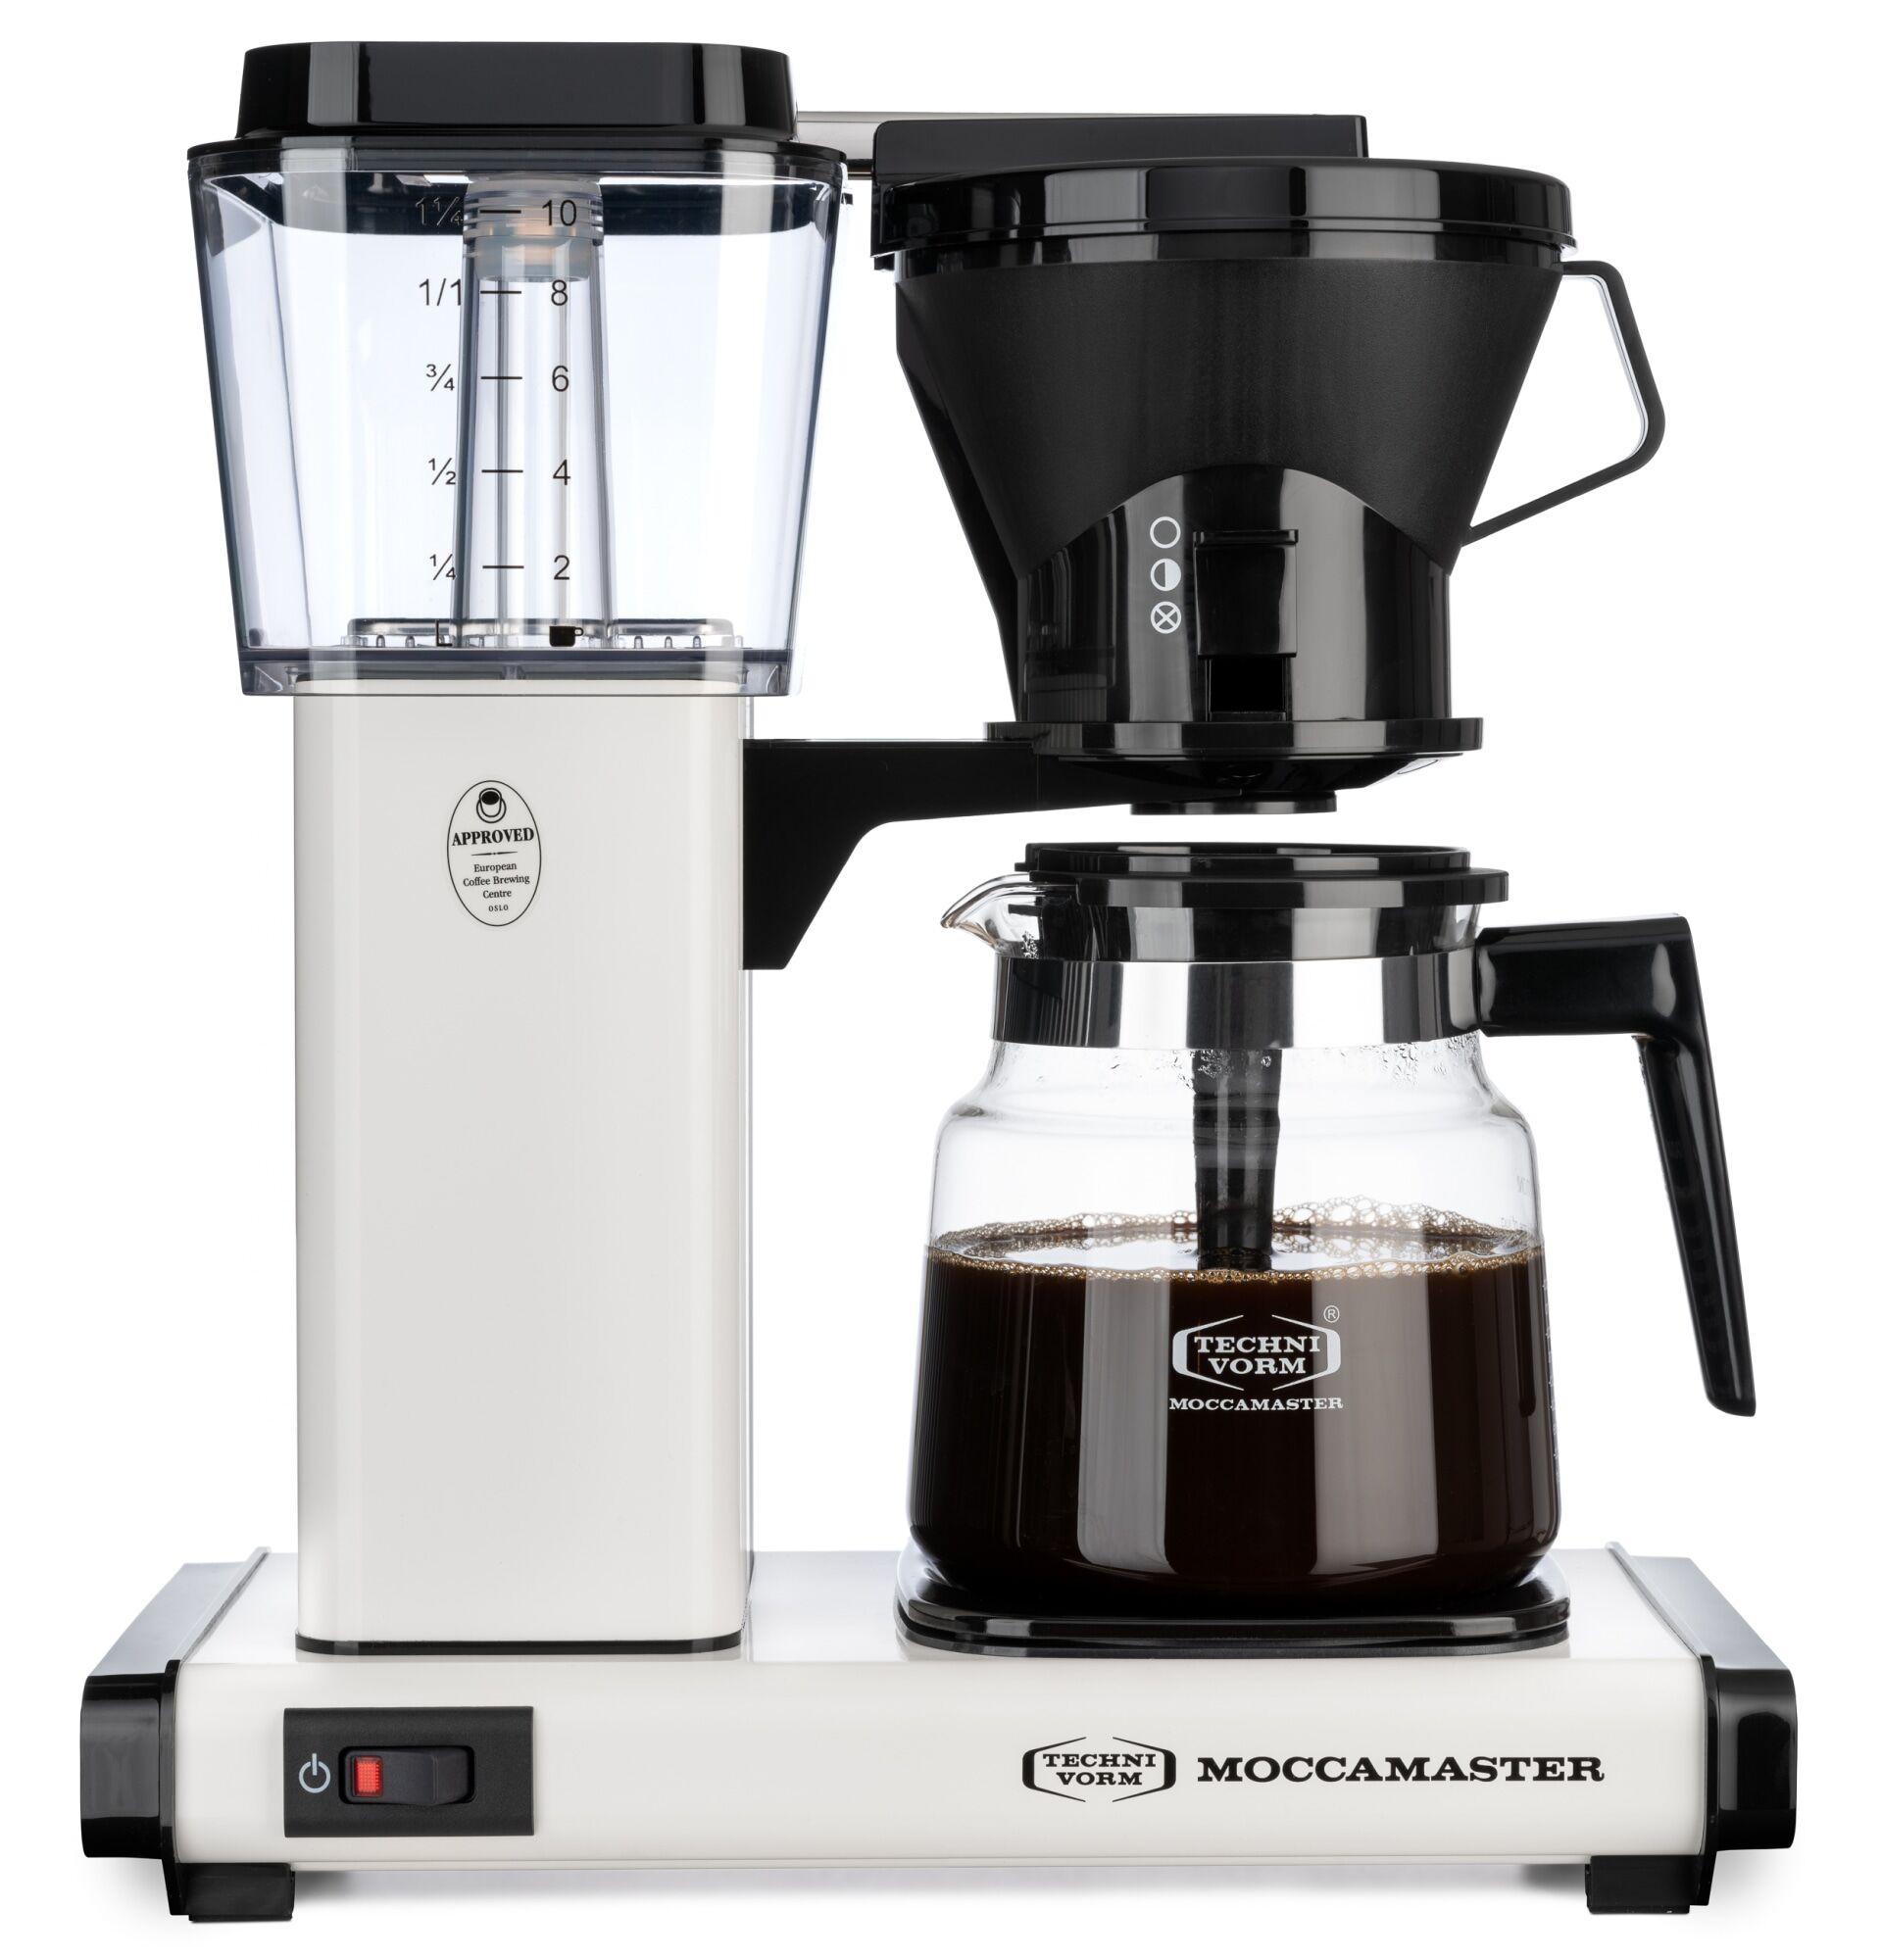 Moccamaster HB941 kahvinkeitin